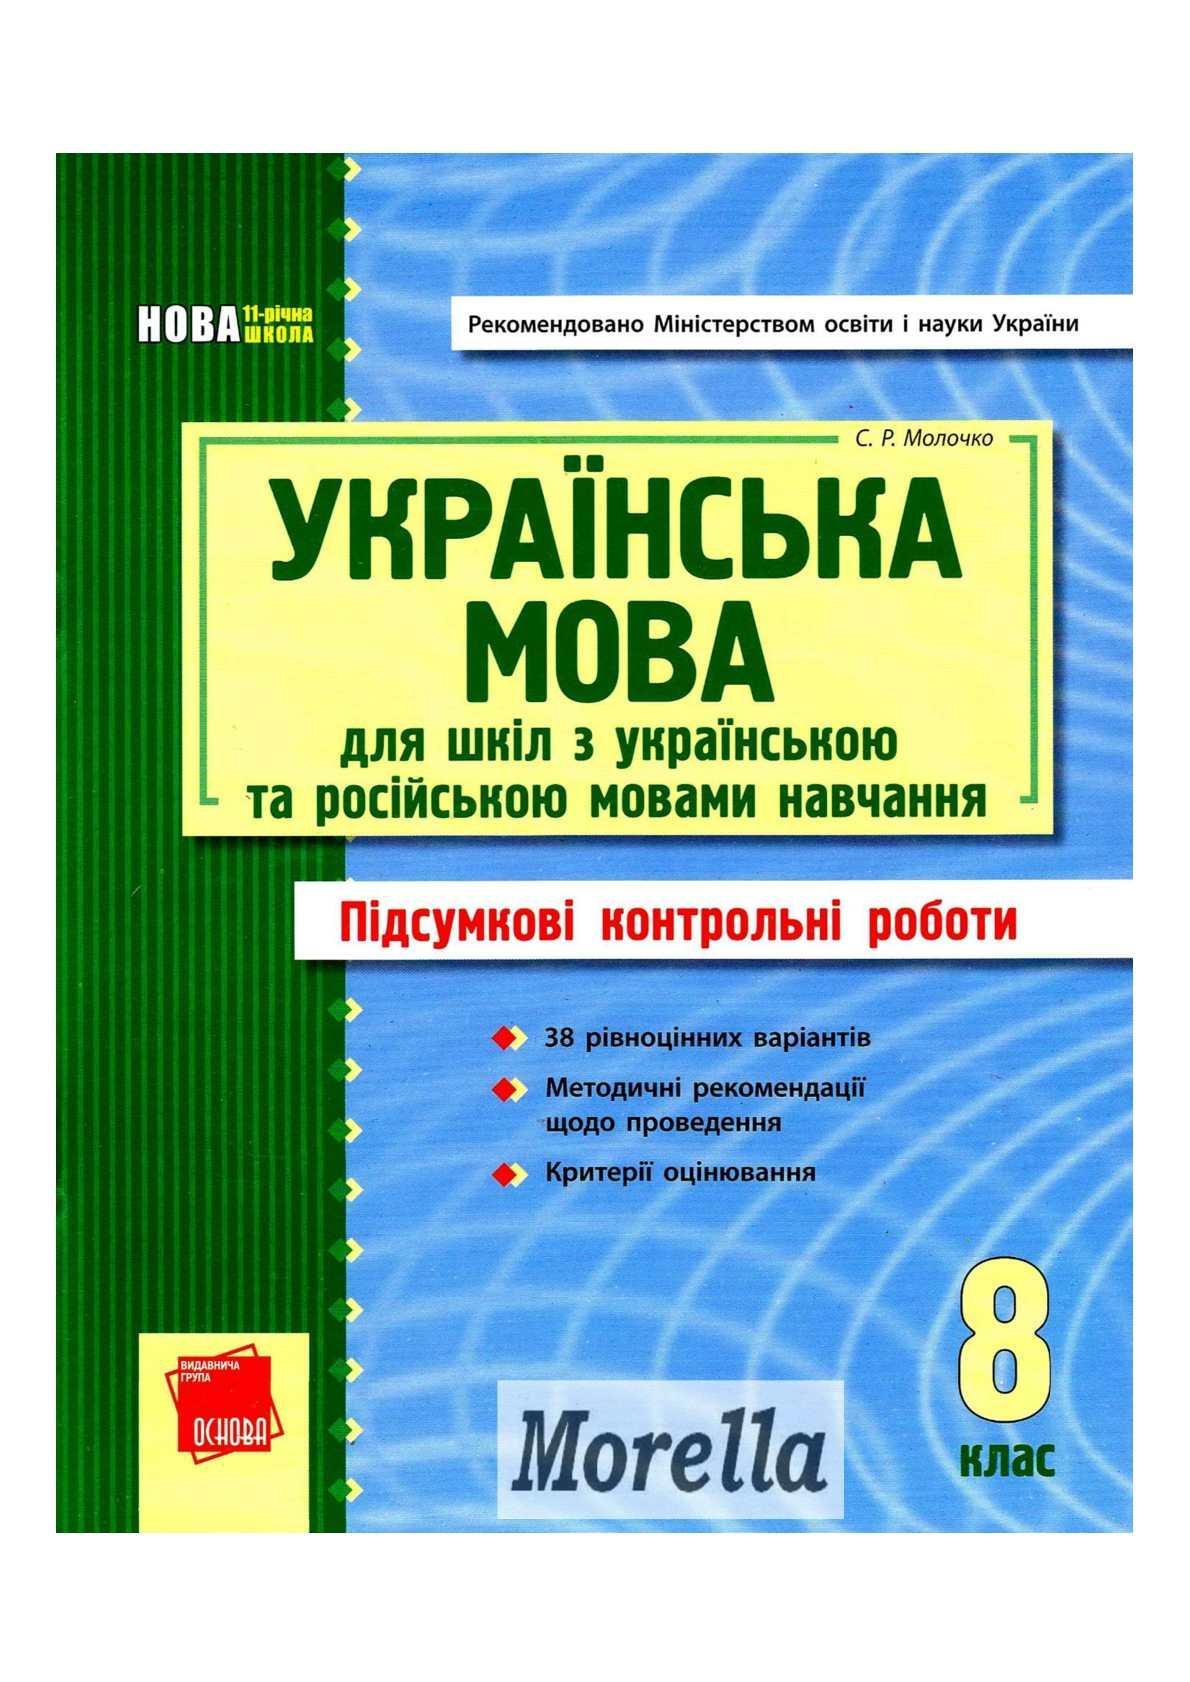 Calaméo - mova8 493f7f8c54881